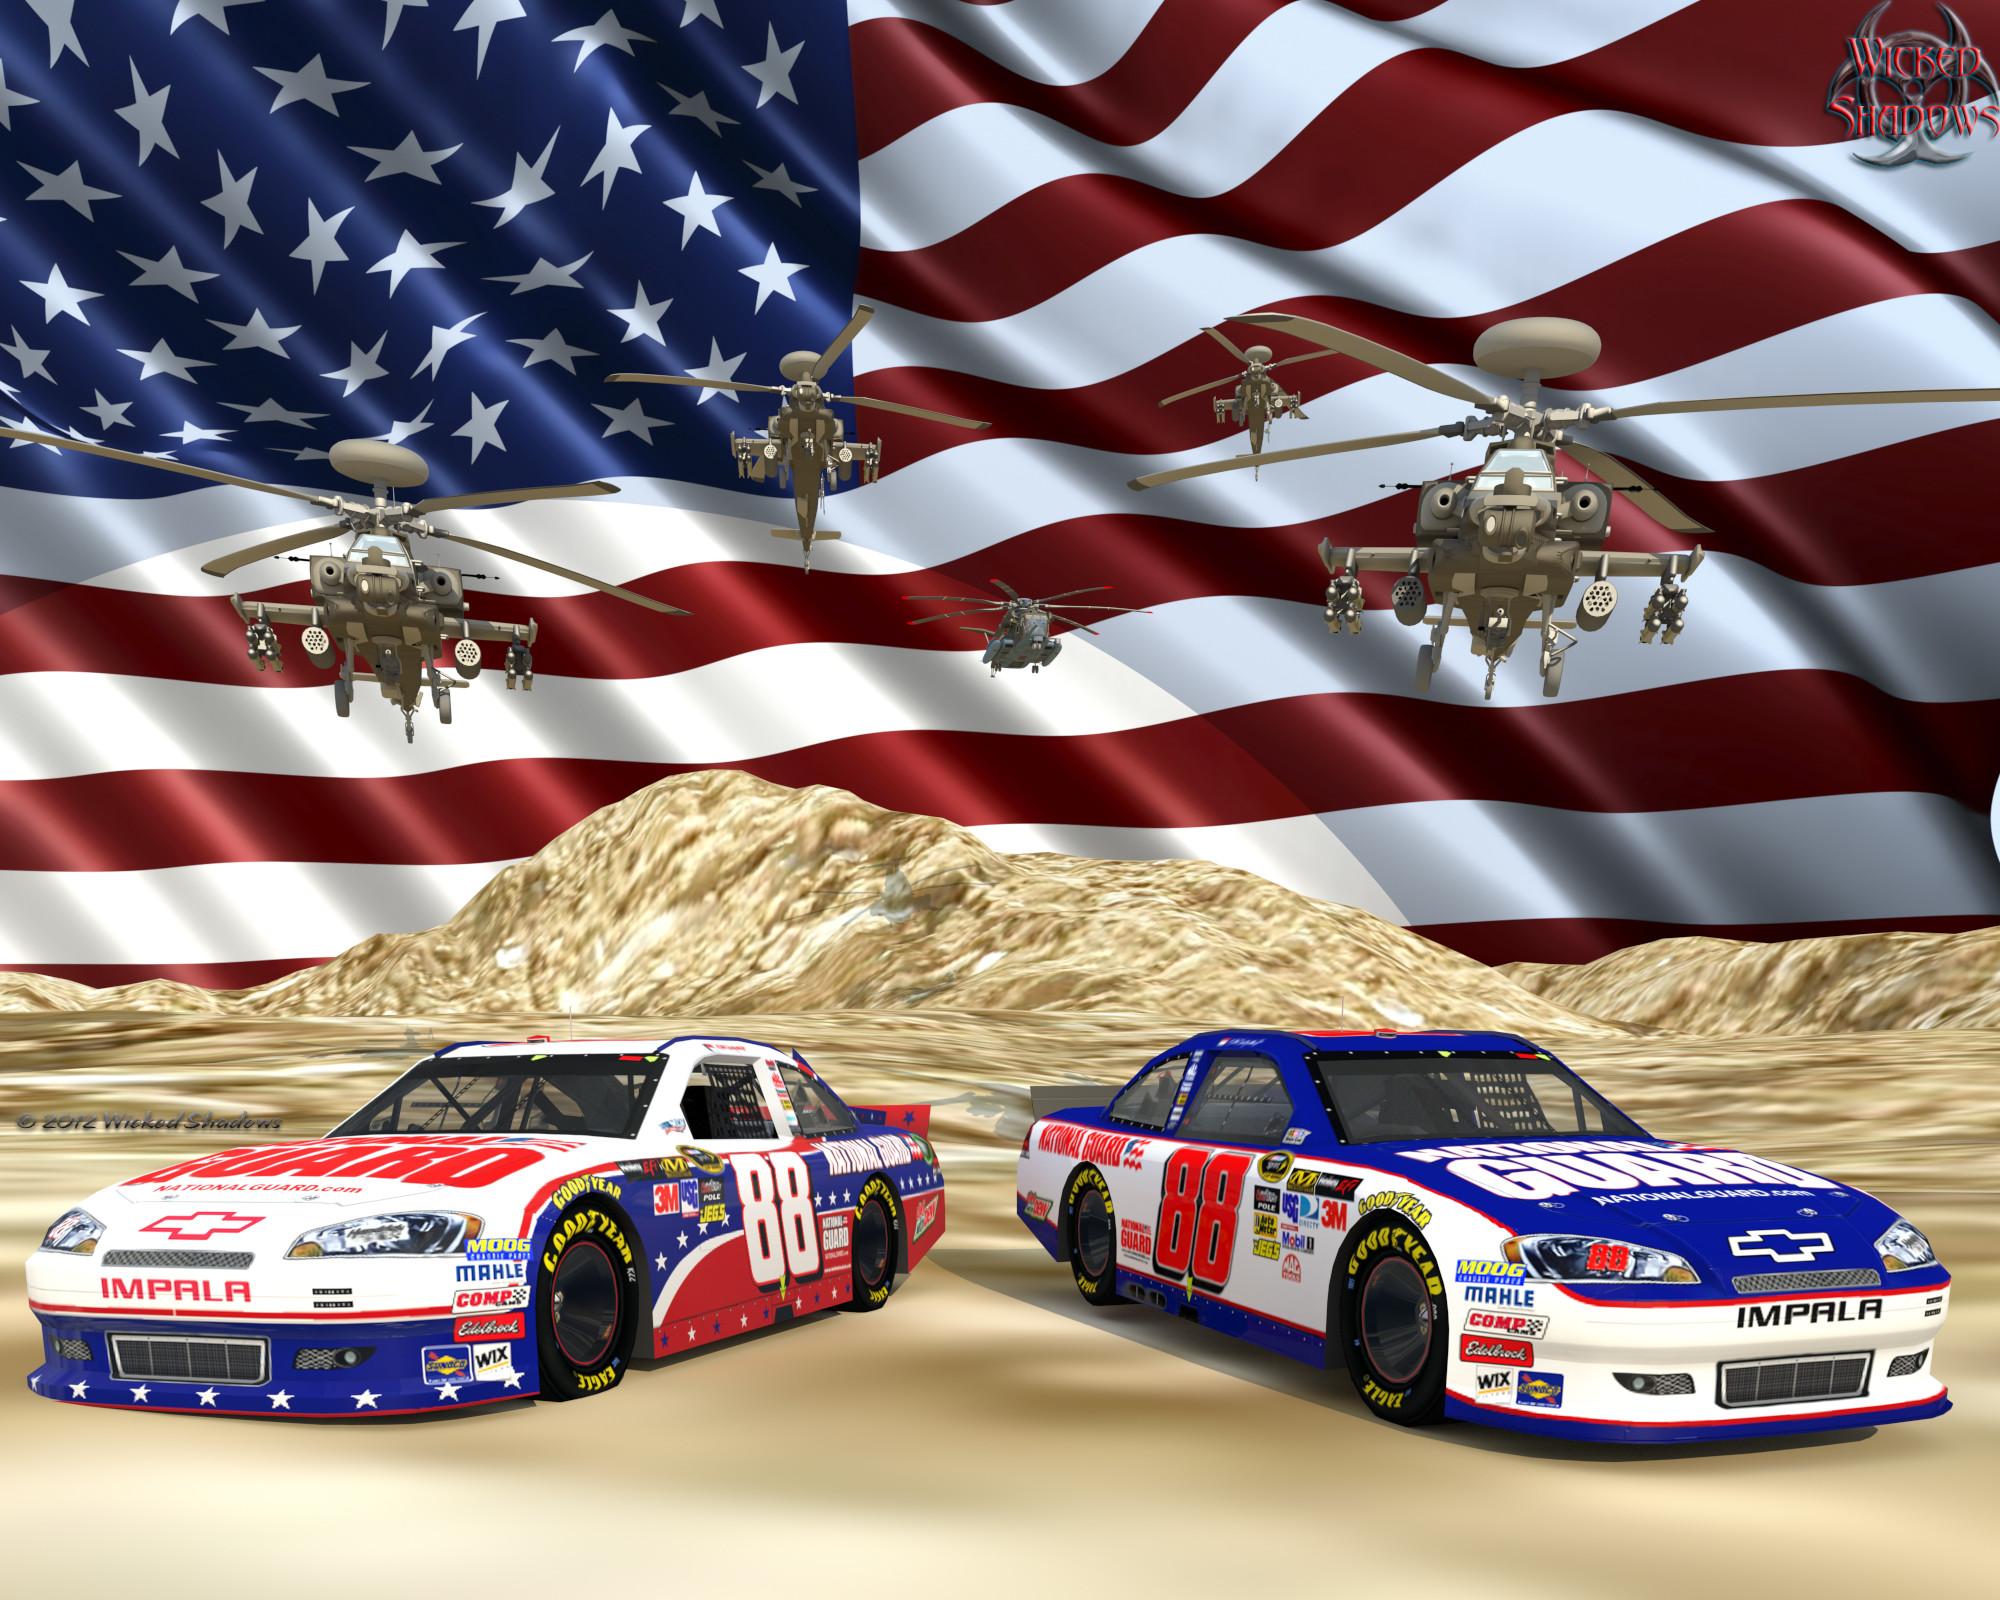 le Dale Earnhardt Jr. Nascar Unites National Guard Ver. 2 Wallpaper  Facebook Cover Photo | 4×3 | 5×4 …